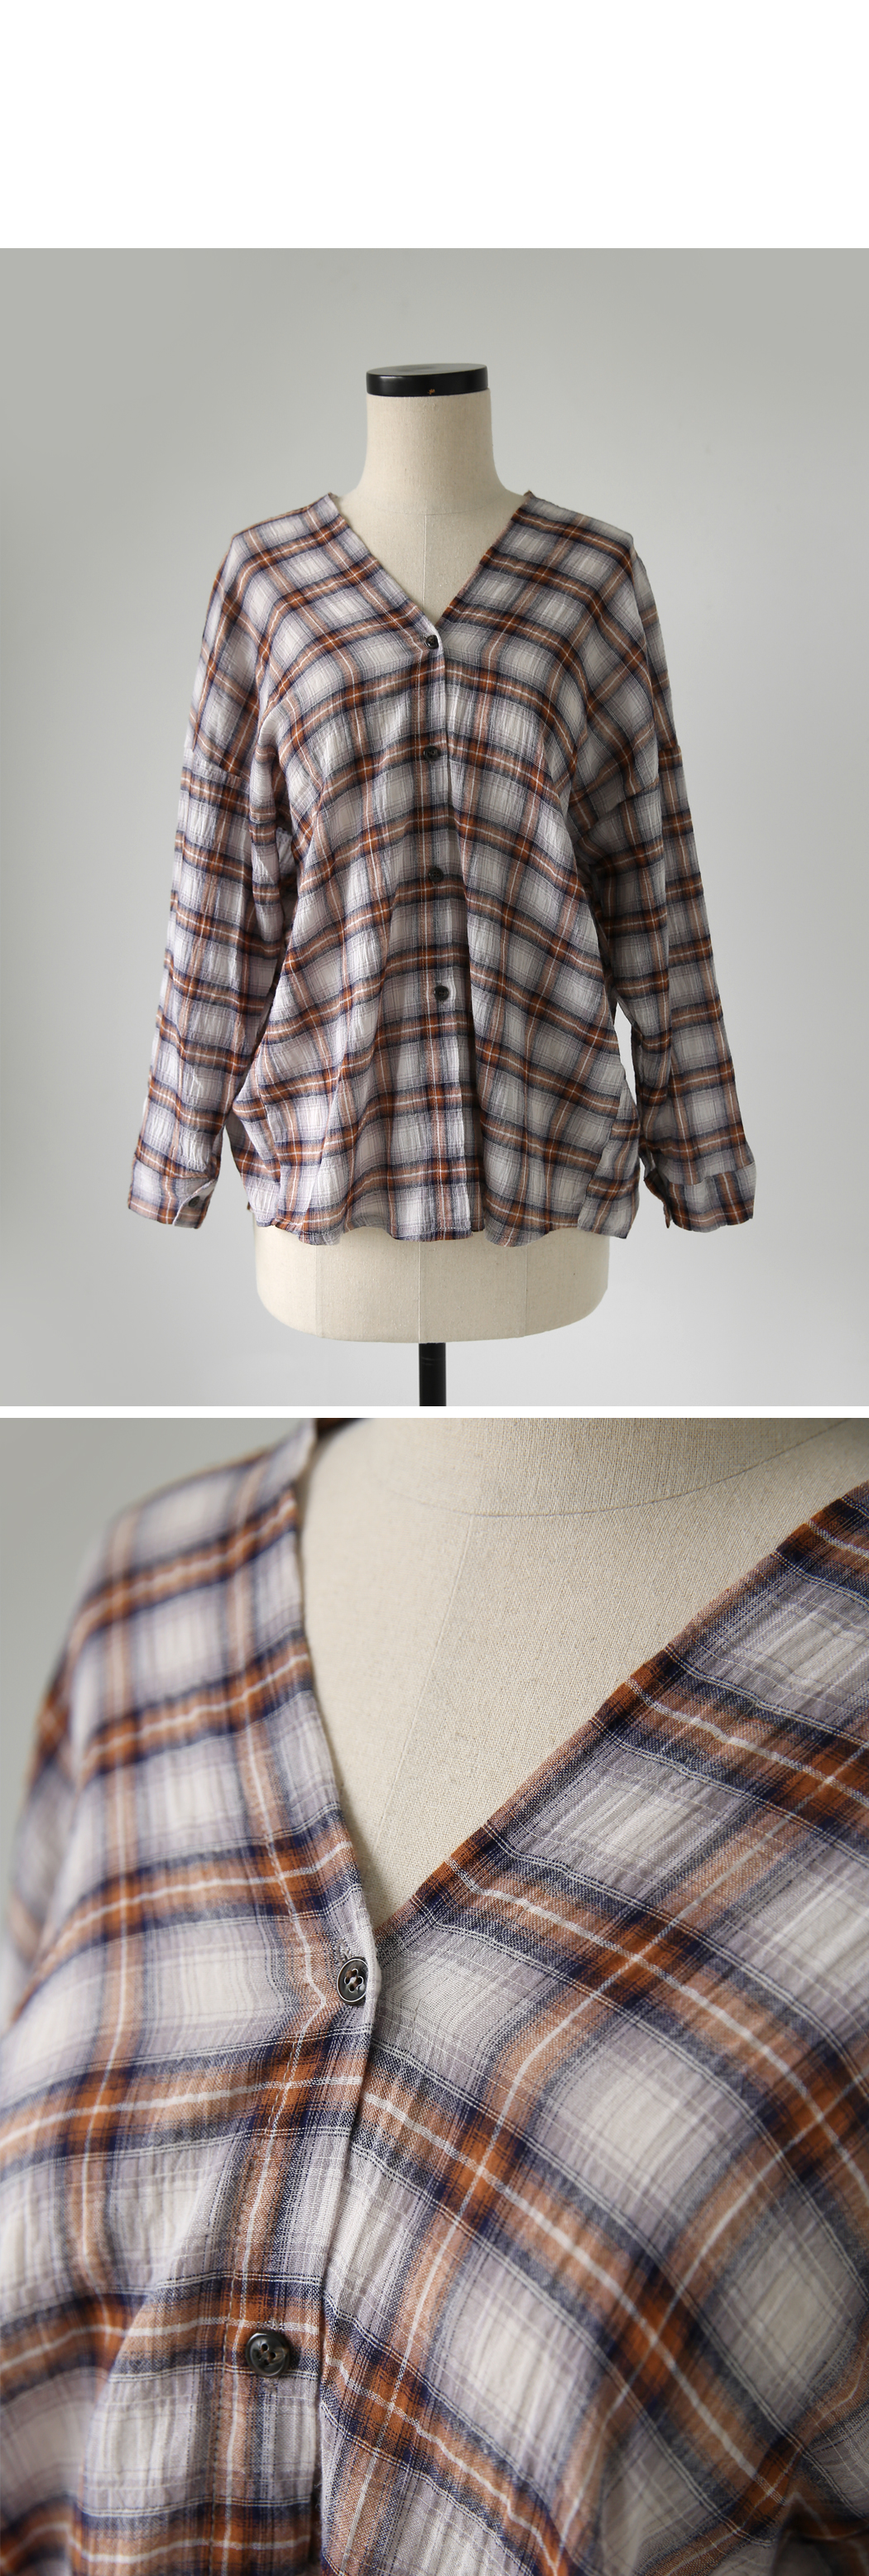 Jadick front and back V-neck check shirt